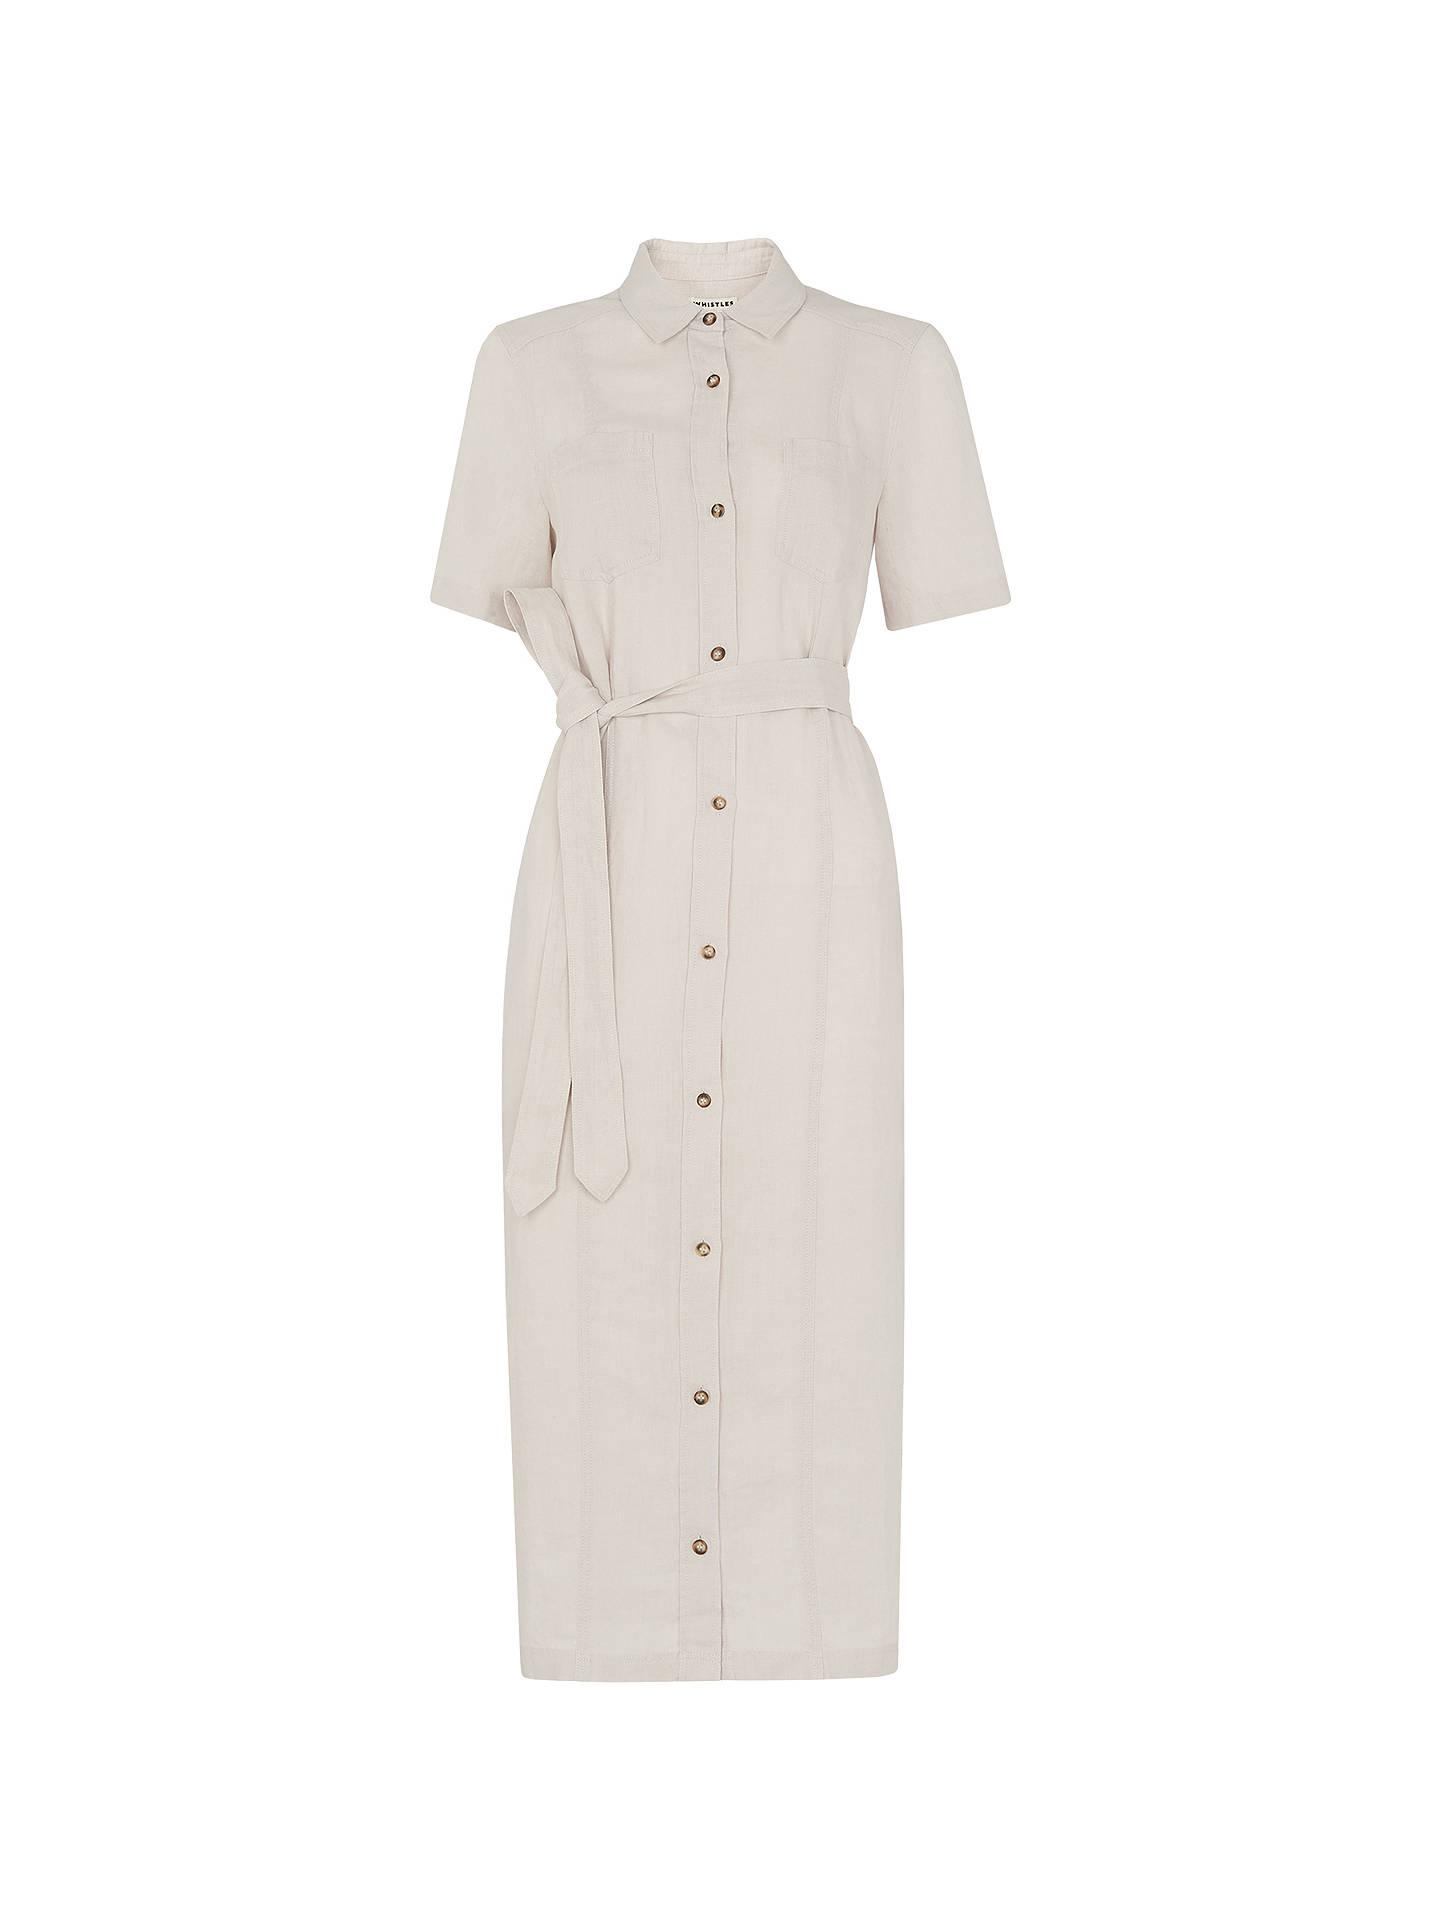 ae7147c9271 ... Buy Whistles Bella Linen Shirt Dress